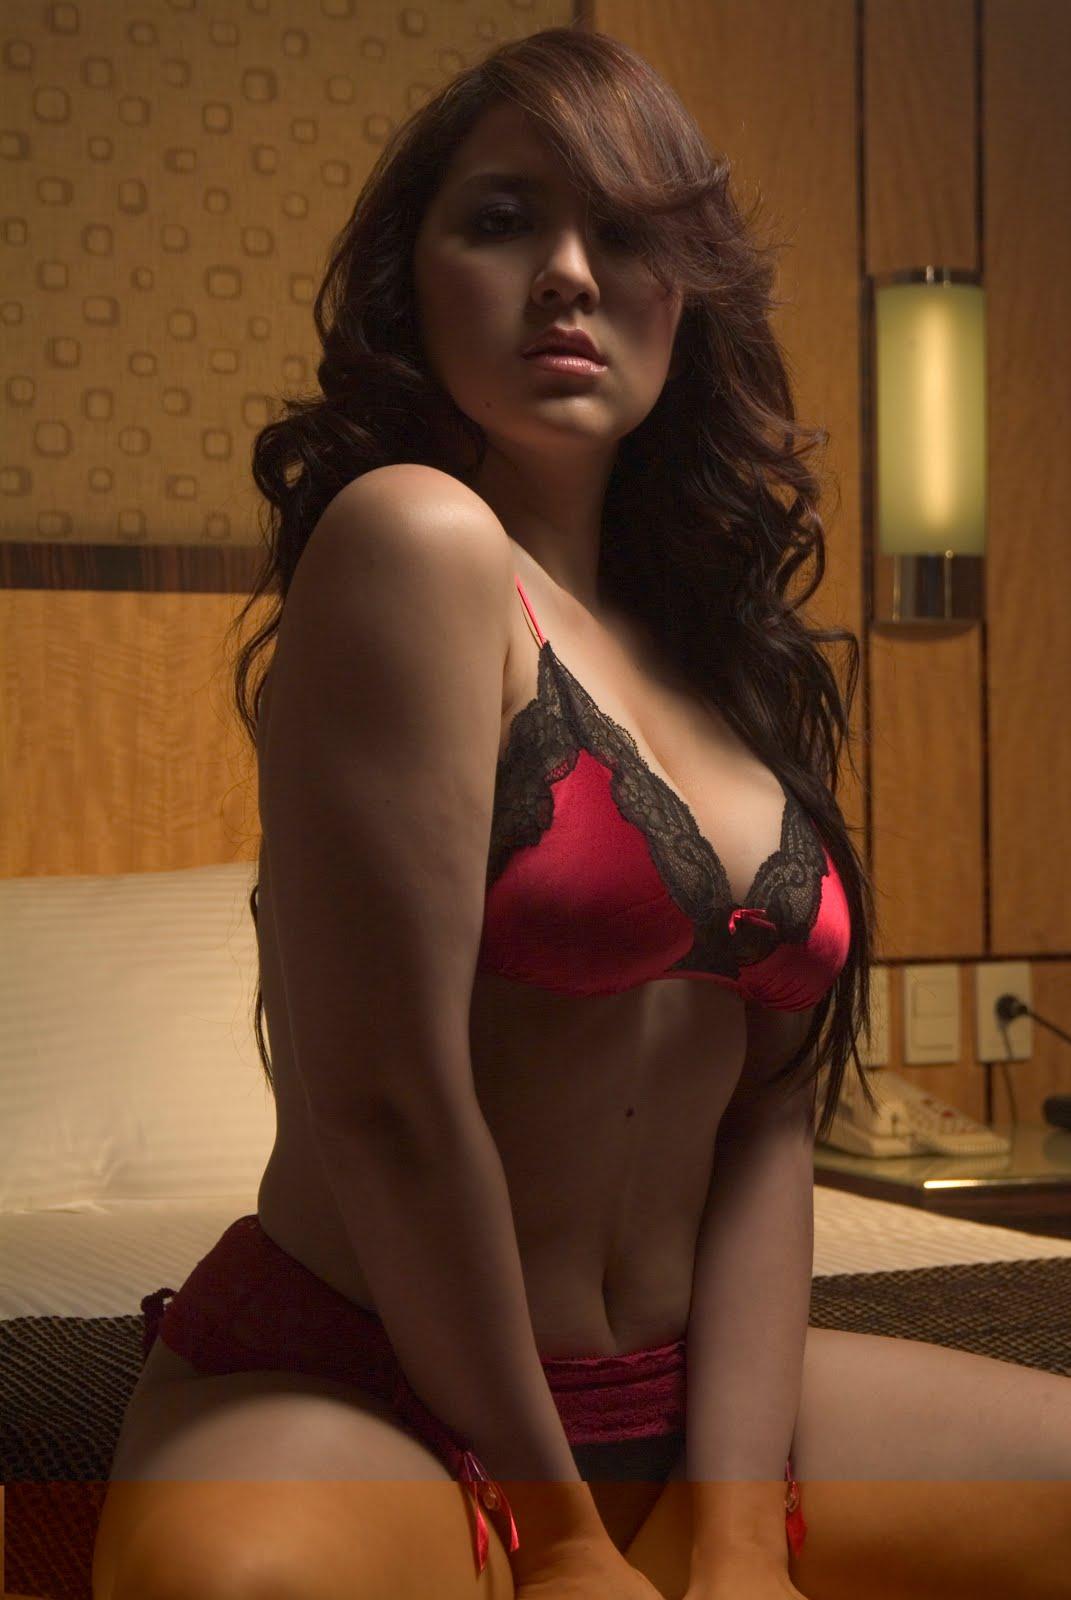 Motel amatuer young latino sex